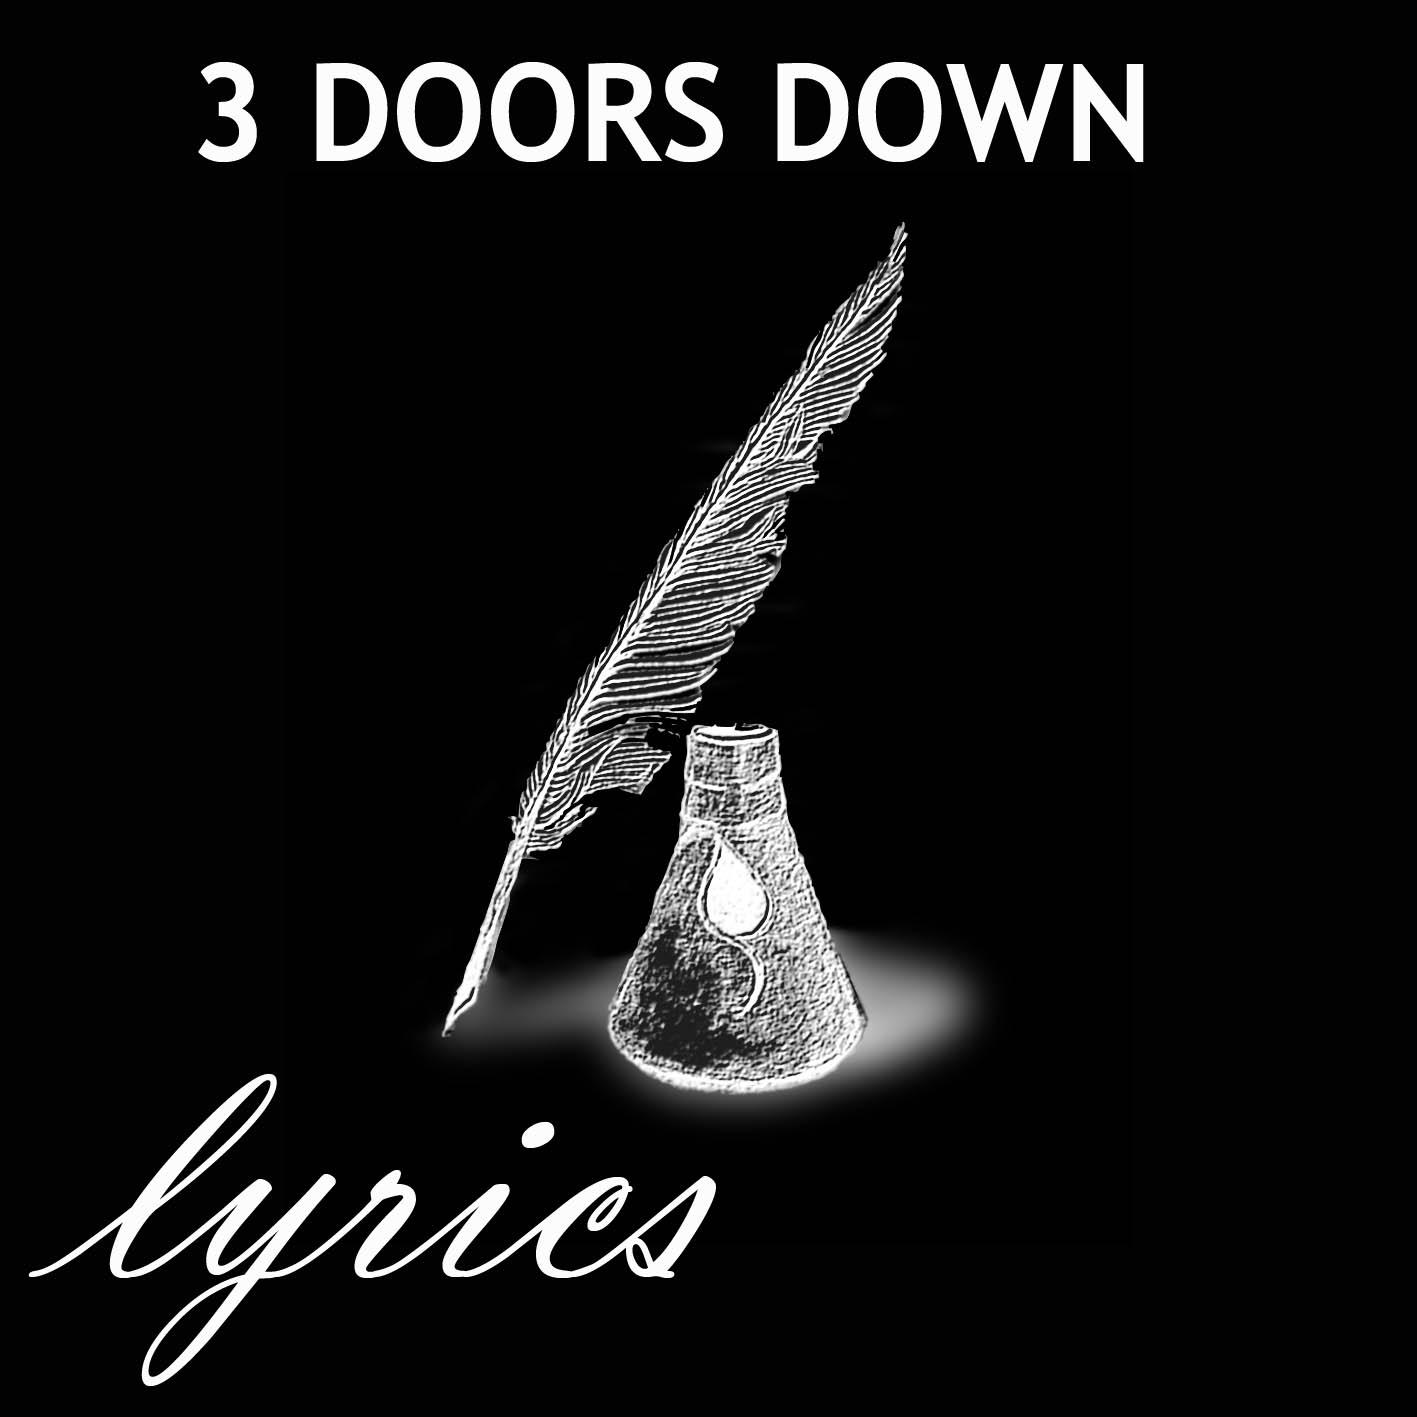 http://4.bp.blogspot.com/-2DxzvdeuKb4/Tloty6ZJONI/AAAAAAAADKc/XJNWs7msv8g/s1600/3+doors+down.jpg